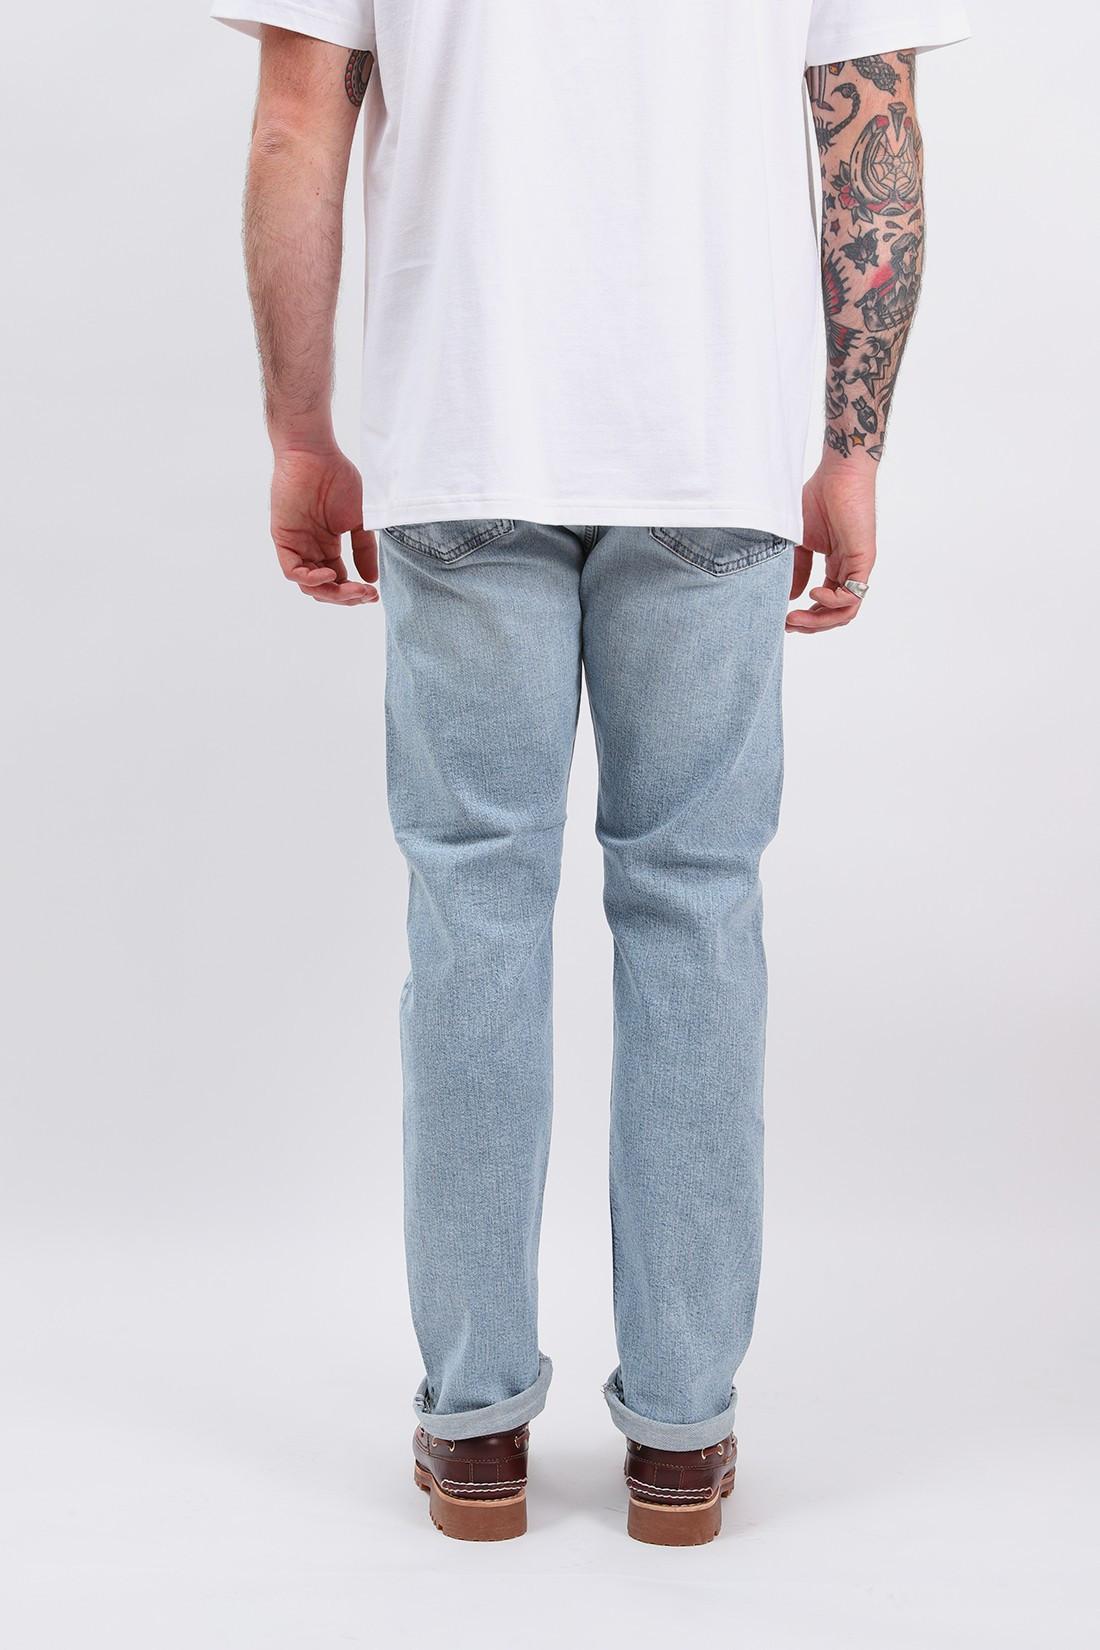 ORSLOW / 107 slim fit selvedge denim Sky blue